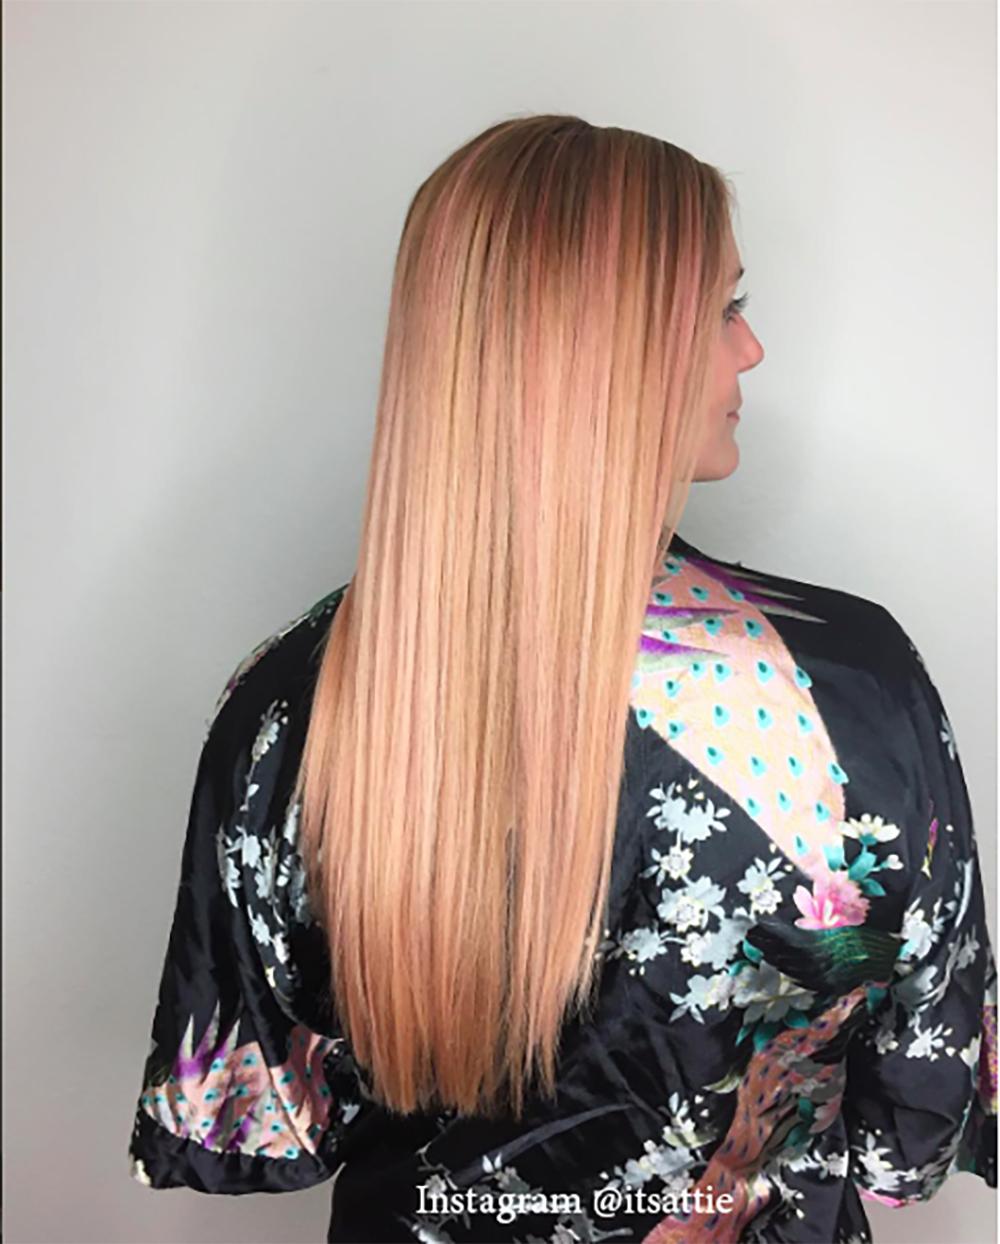 3. Цвет волос - розовое дерево